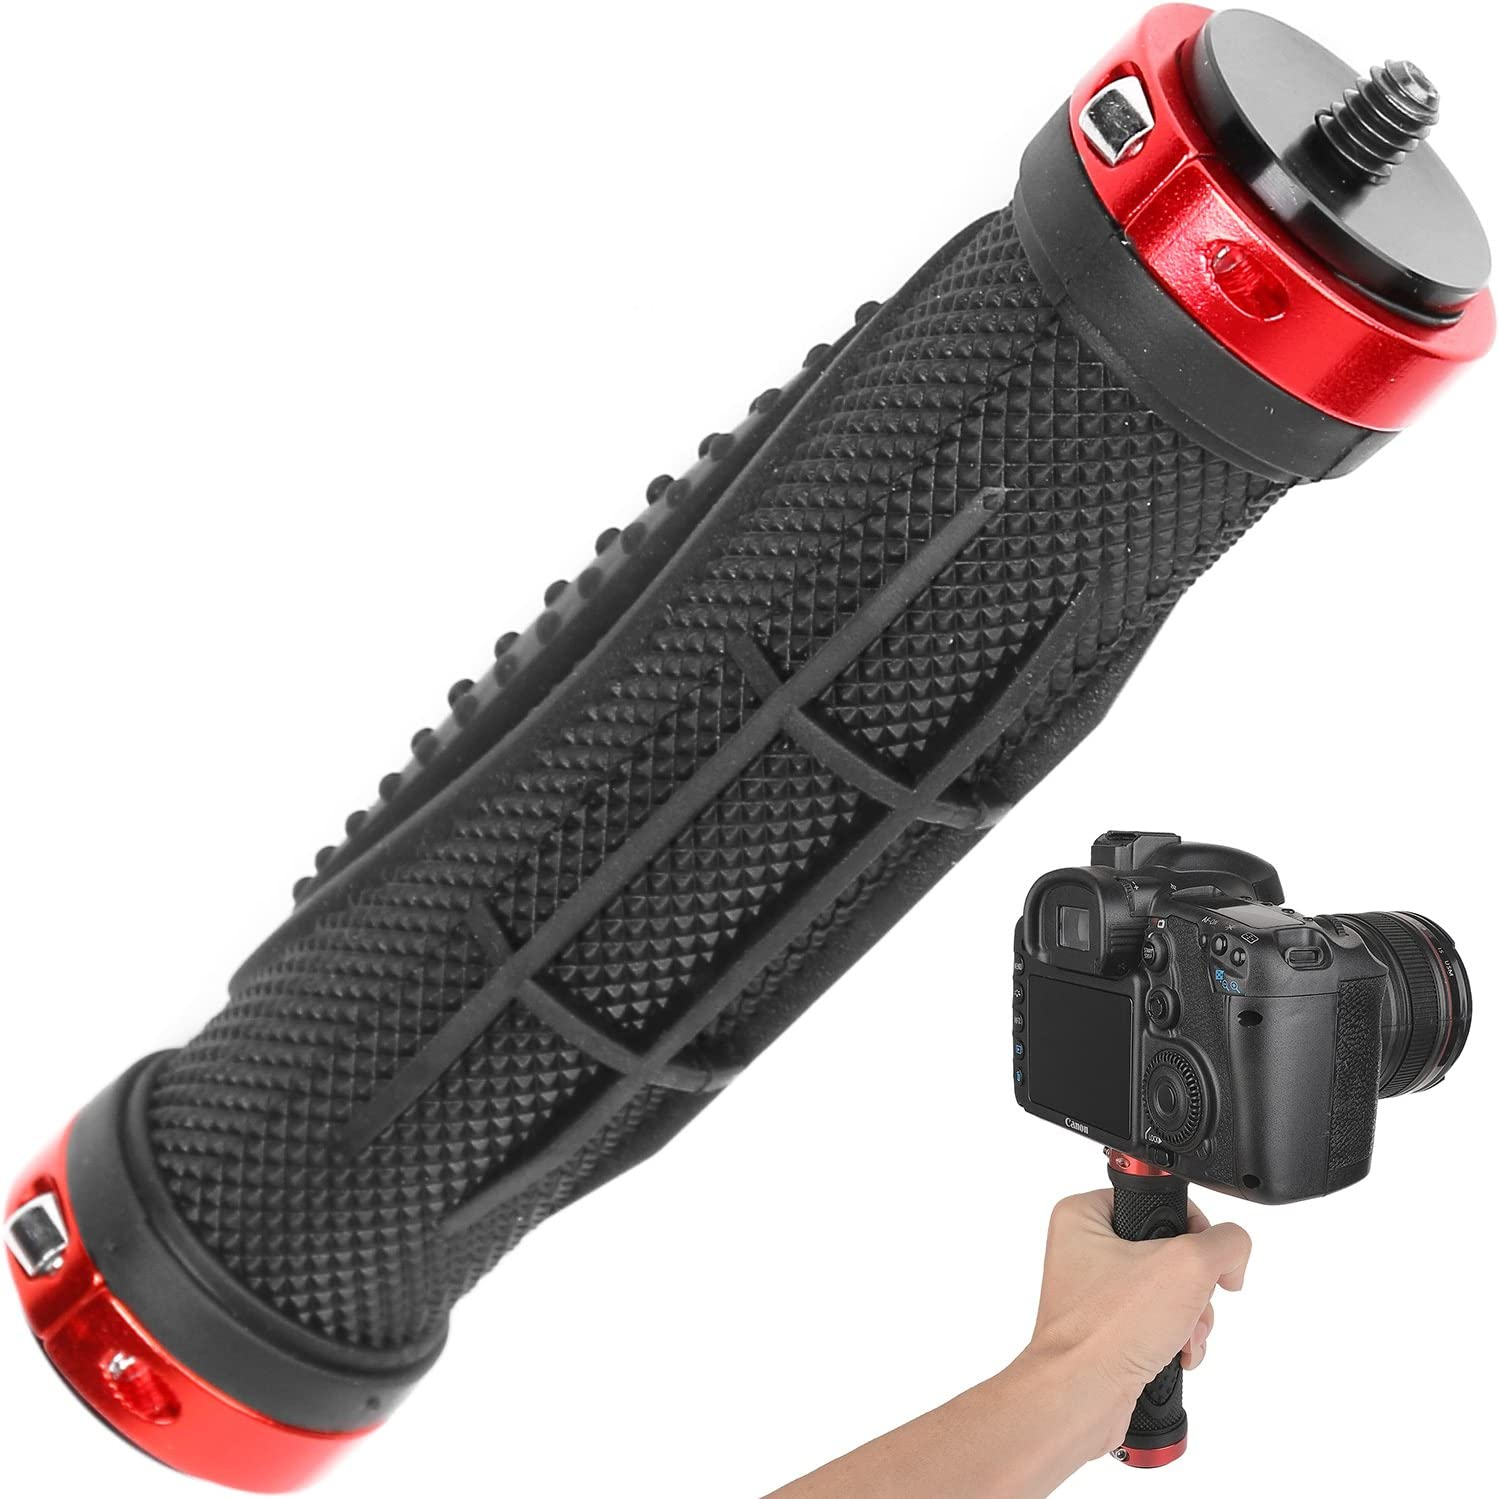 HP Photosmart R817 Vertical Shoe Mount Stabilizer Handle Pro Video Stabilizing Handle Grip for